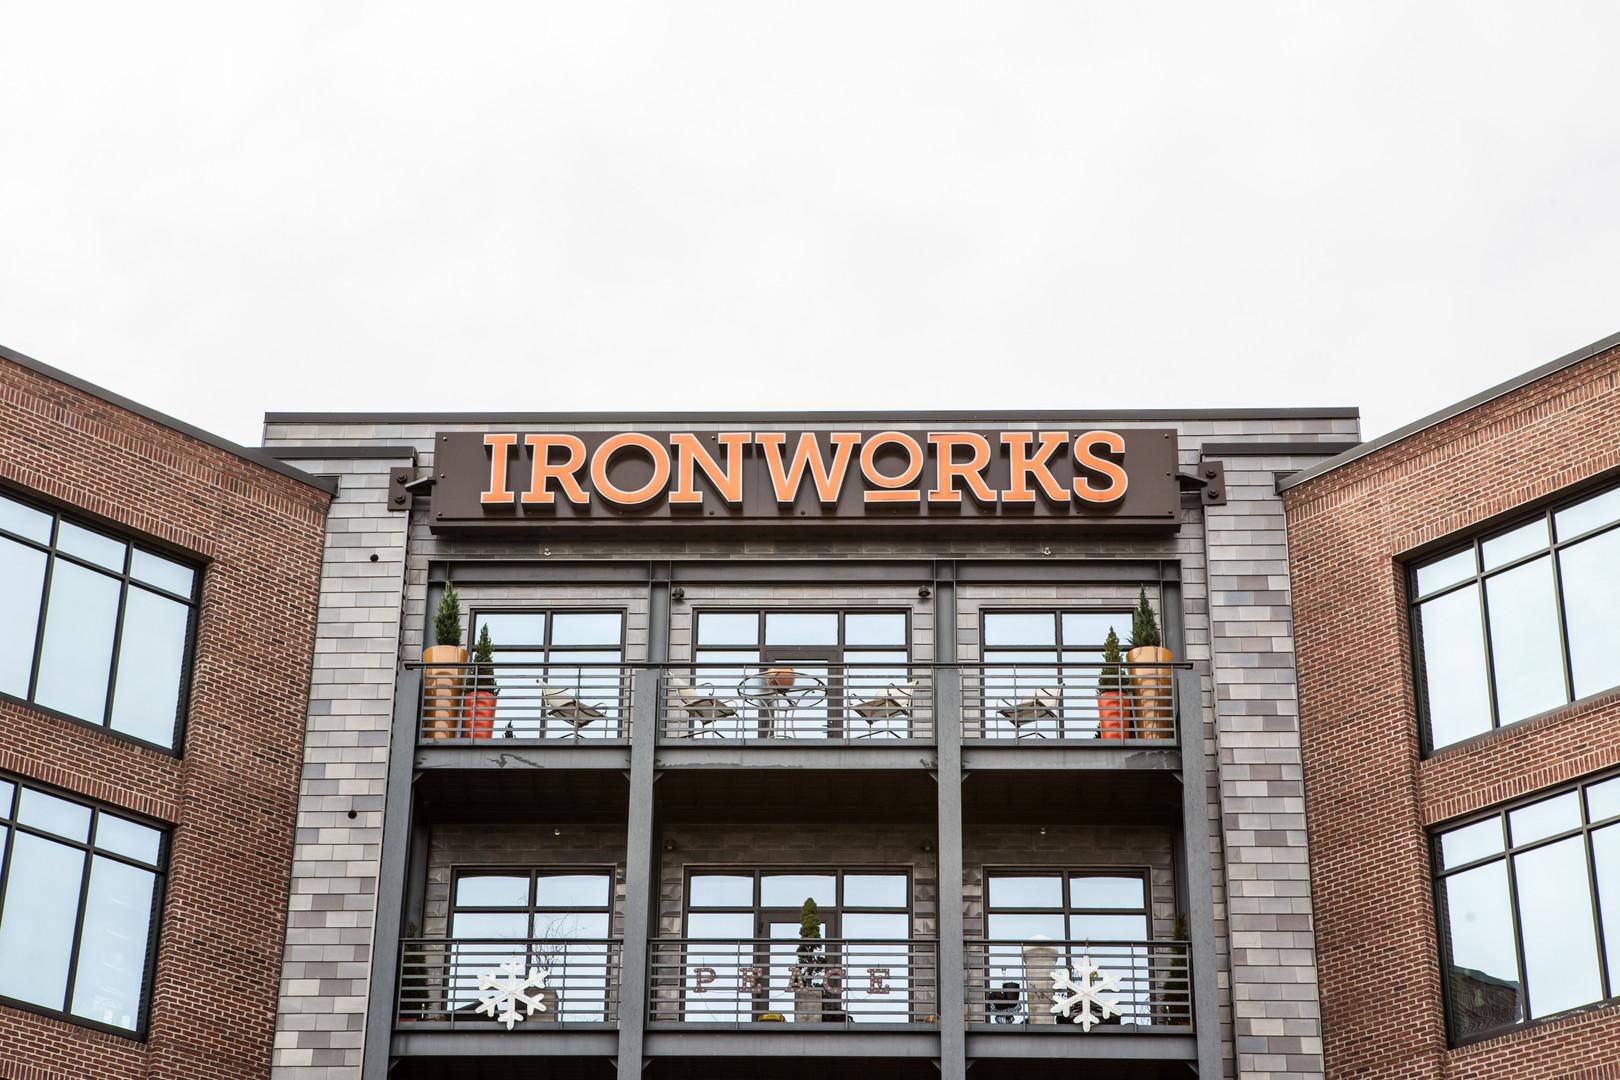 Ironworks Exterior-21.jpg